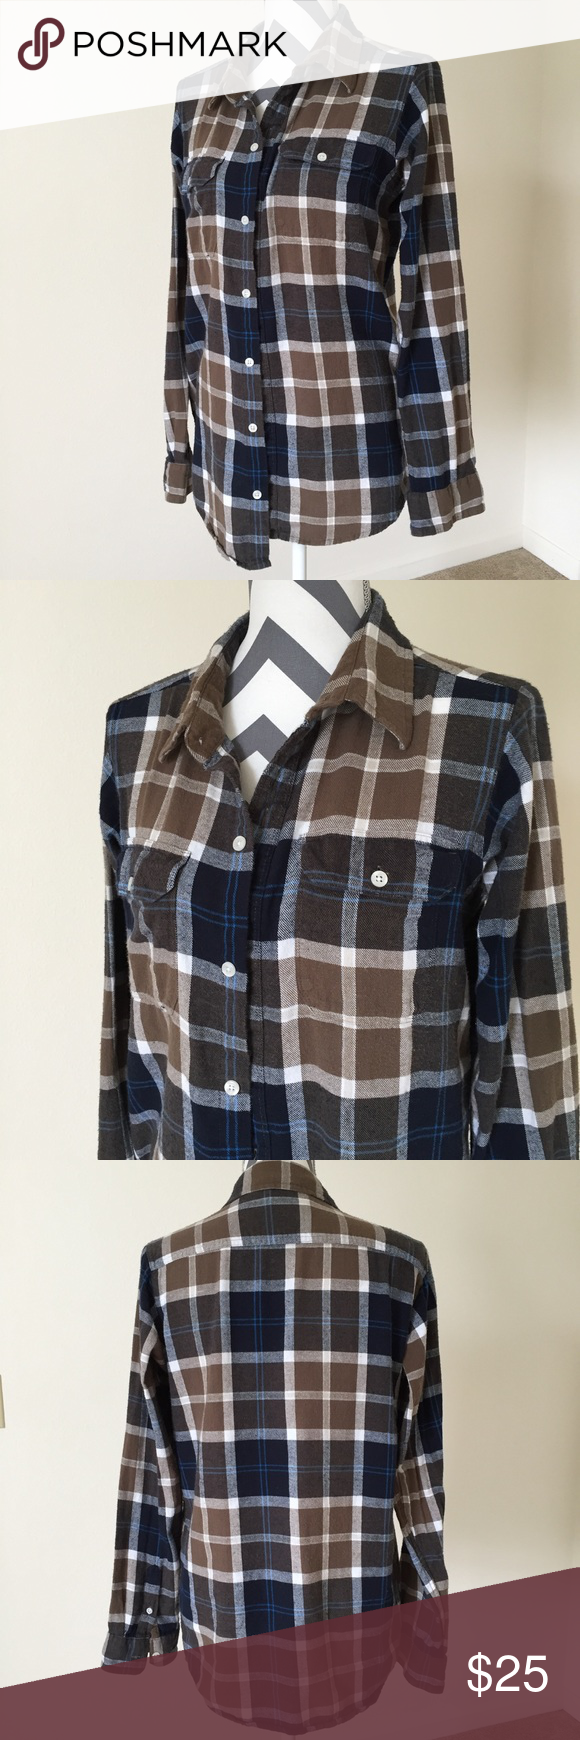 Flannel shirt season  Urban Pipeline Brown Navy Flannel Top Size XL  Flannel shirts